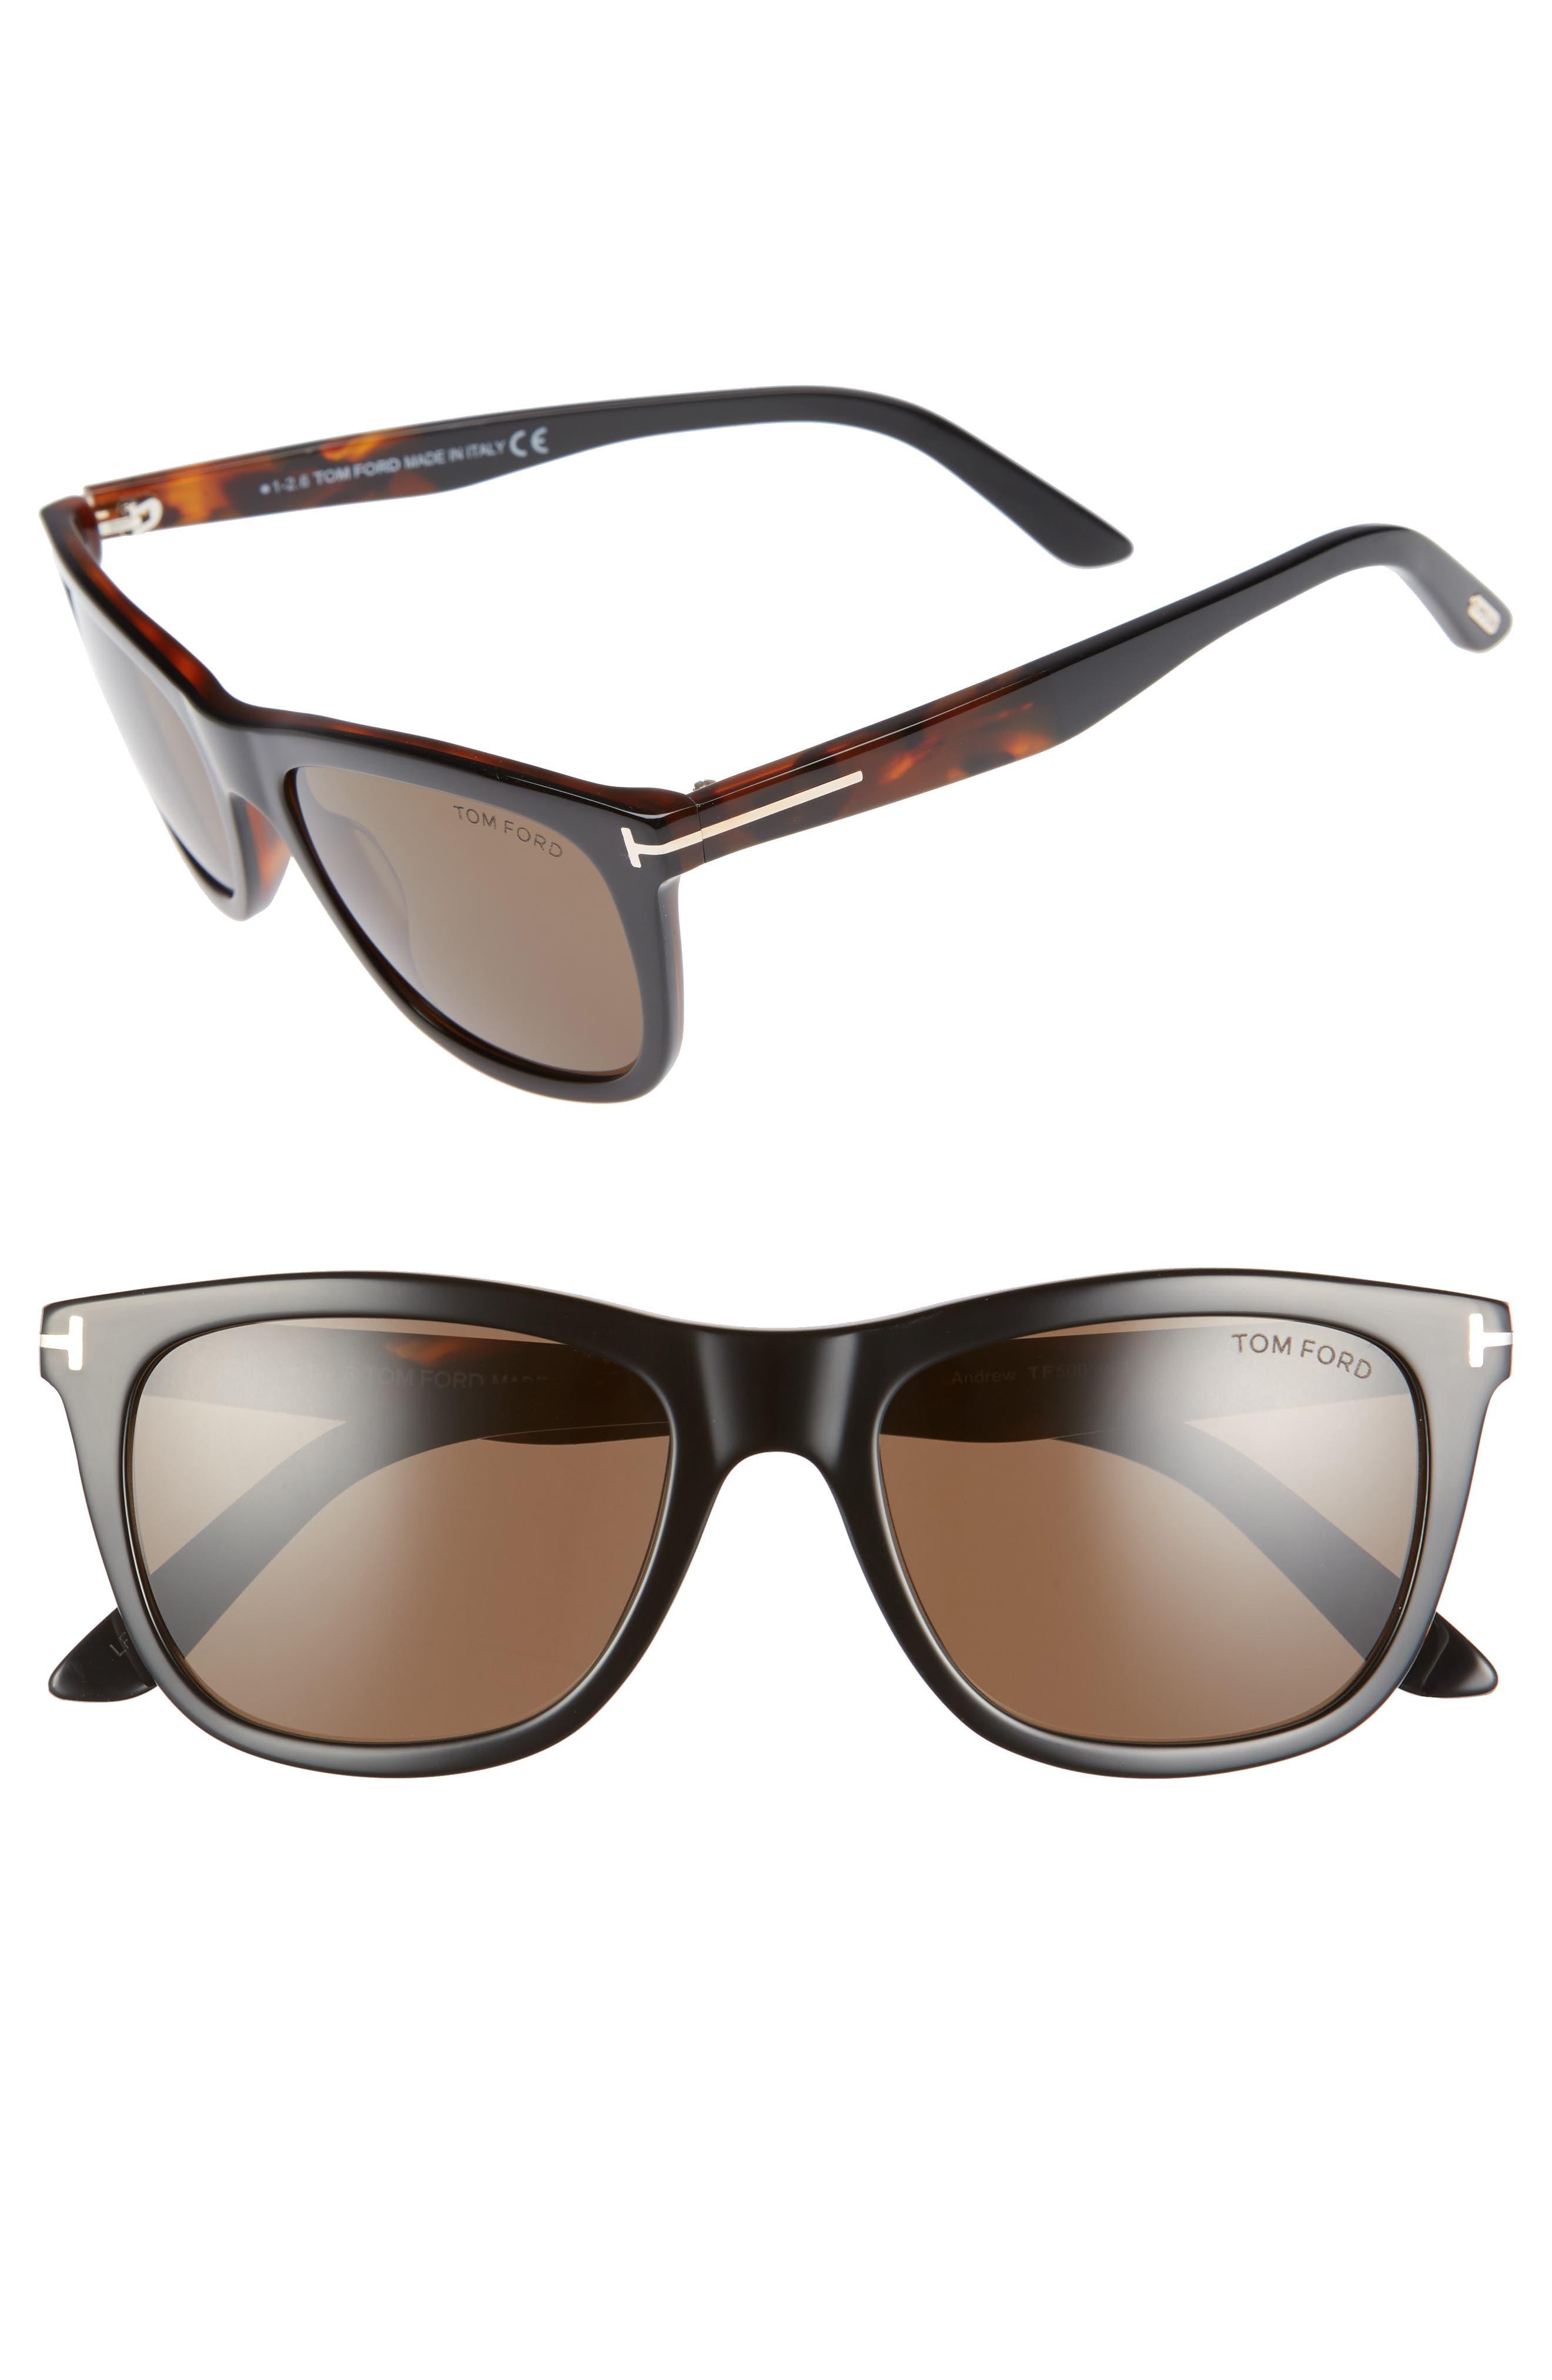 Andrew 54mm Polarized Sunglasses,                         Main,                         color, BLACK/ HAVANA